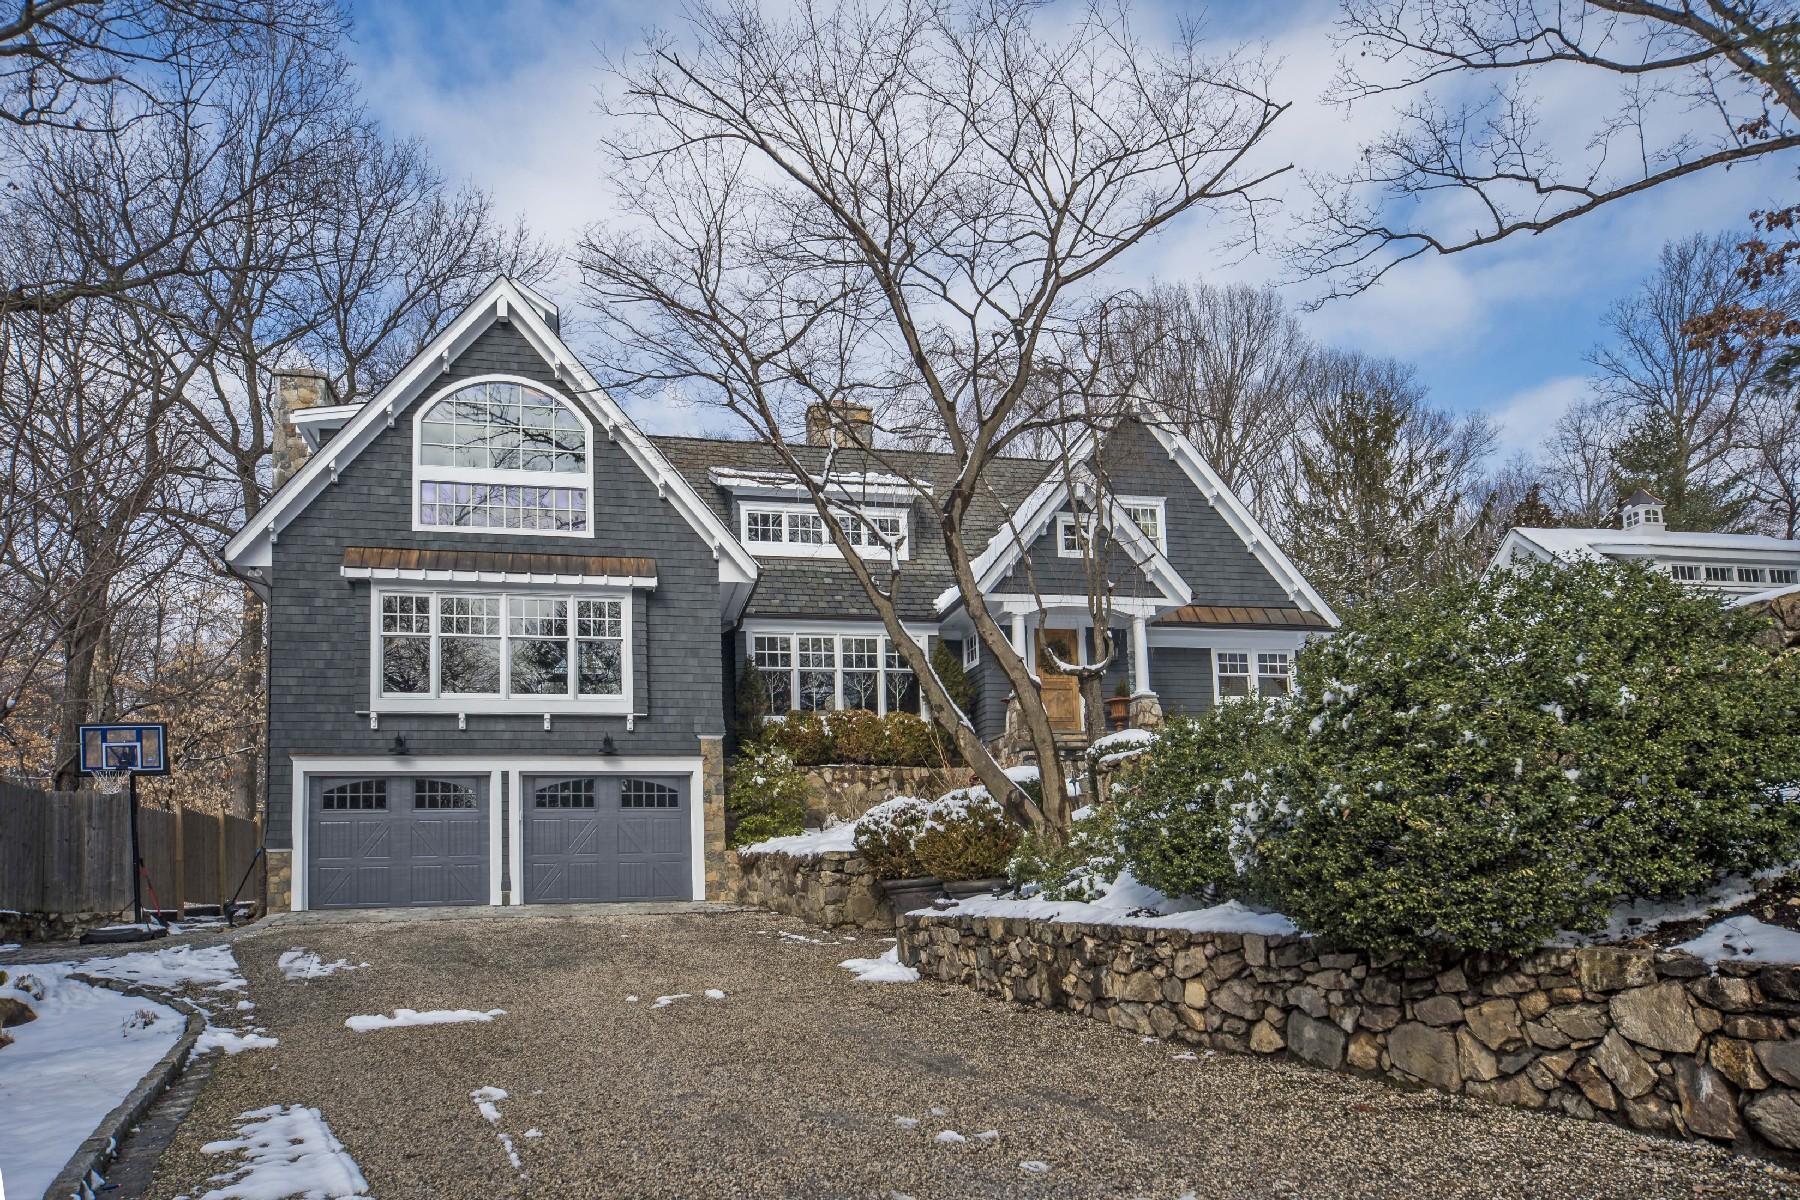 獨棟家庭住宅 為 出售 在 One-Of-A-Kind Home 60 Crooked Trail Rowayton, Norwalk, 康涅狄格州, 06853 美國